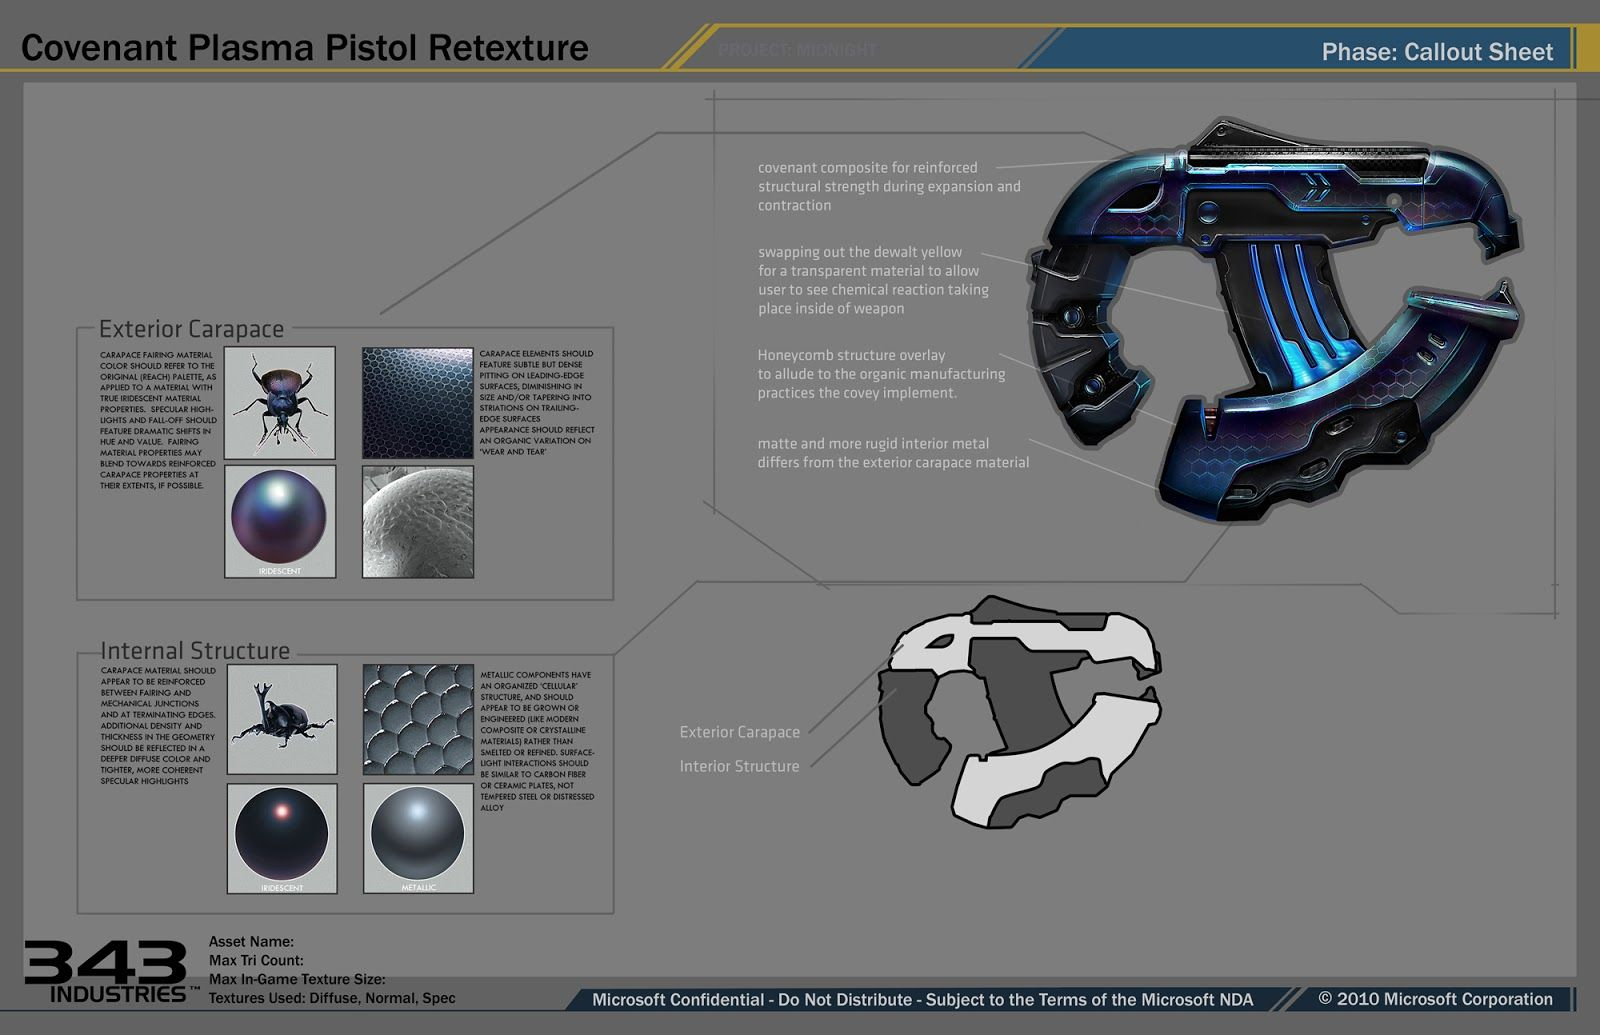 Halo Covenant Symbols Google Search Weapon Design Pinterest